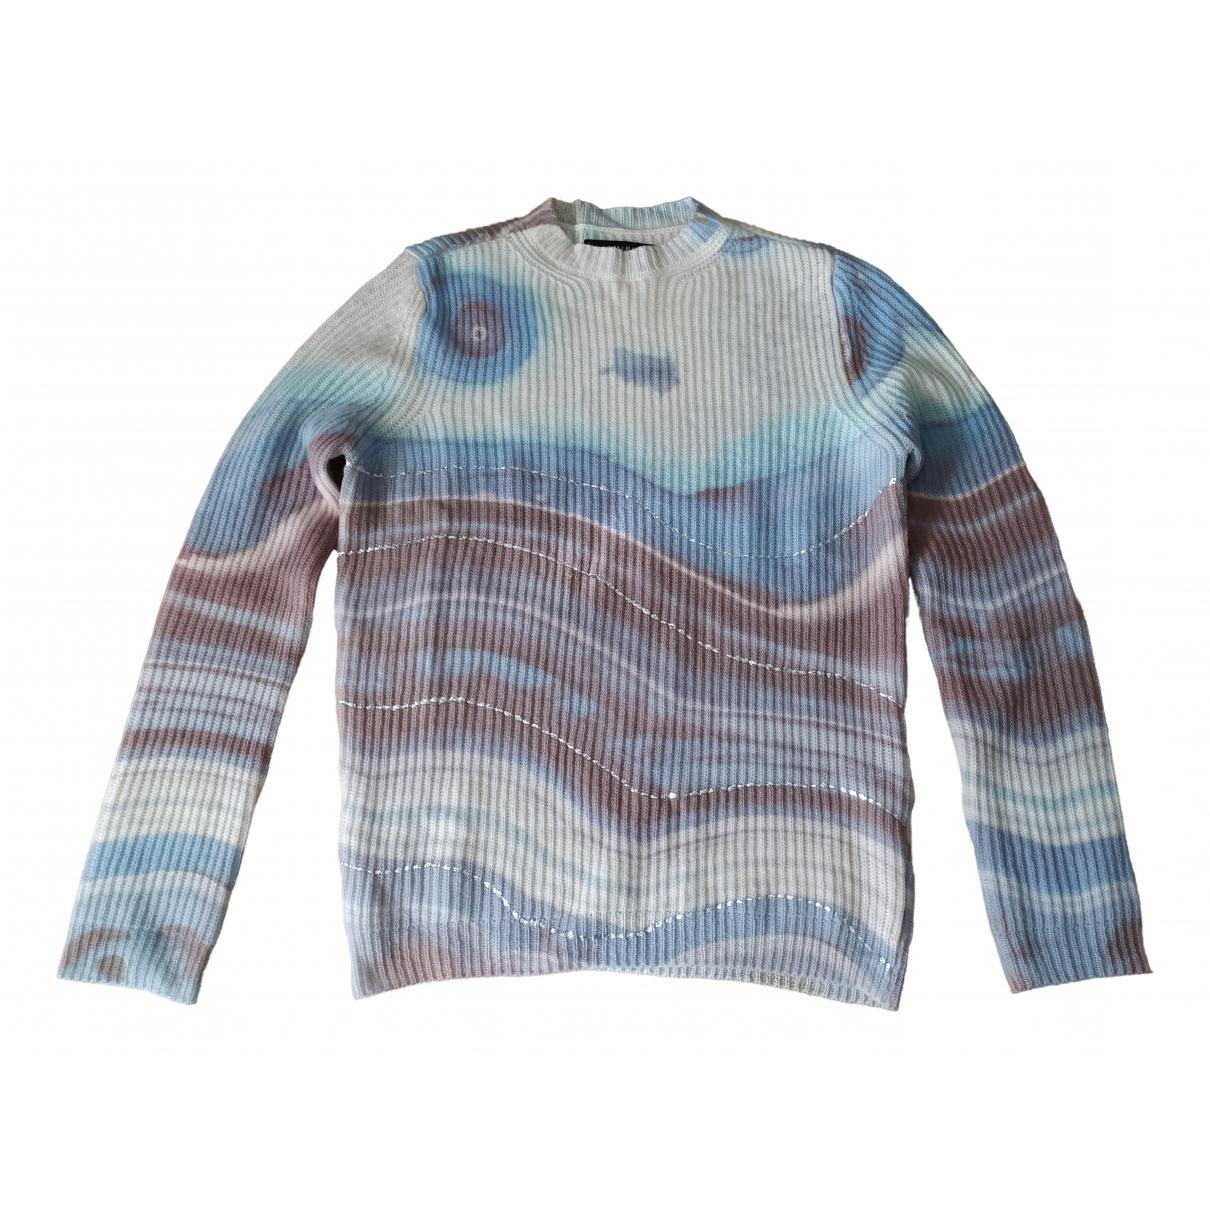 Amiri N Blue Wool Knitwear & Sweatshirts for Men S International